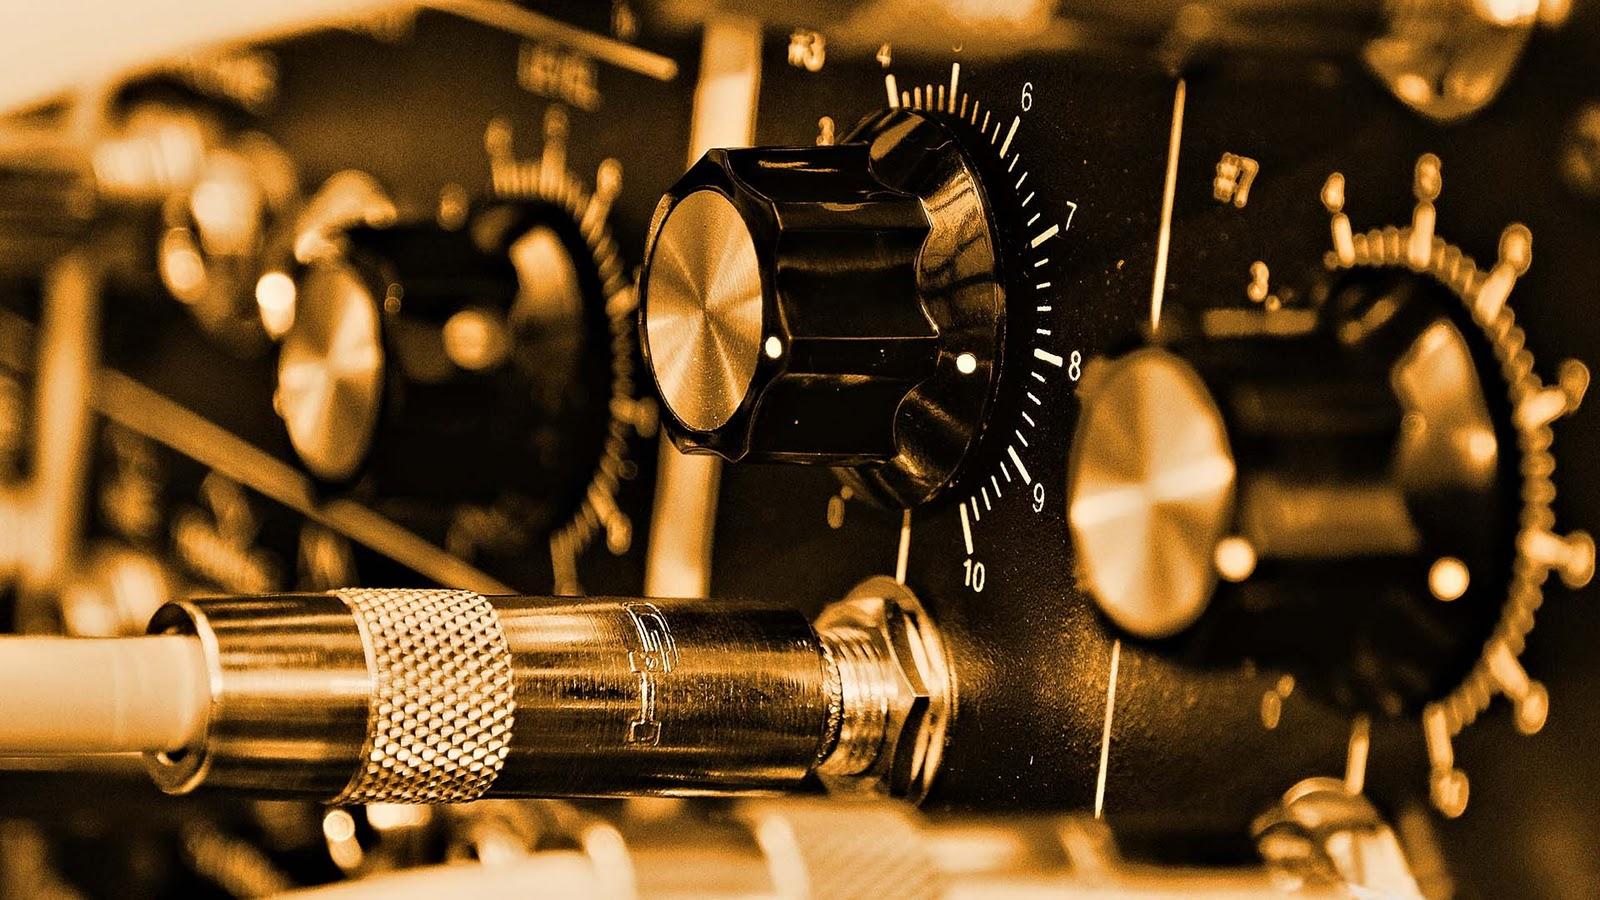 Fender Amp Wallpaper Wallpapersafari Audio Power Amplifier Circuit Hd Walls Find Wallpapers Guitar Controls 1920x1080 Great 1600x900